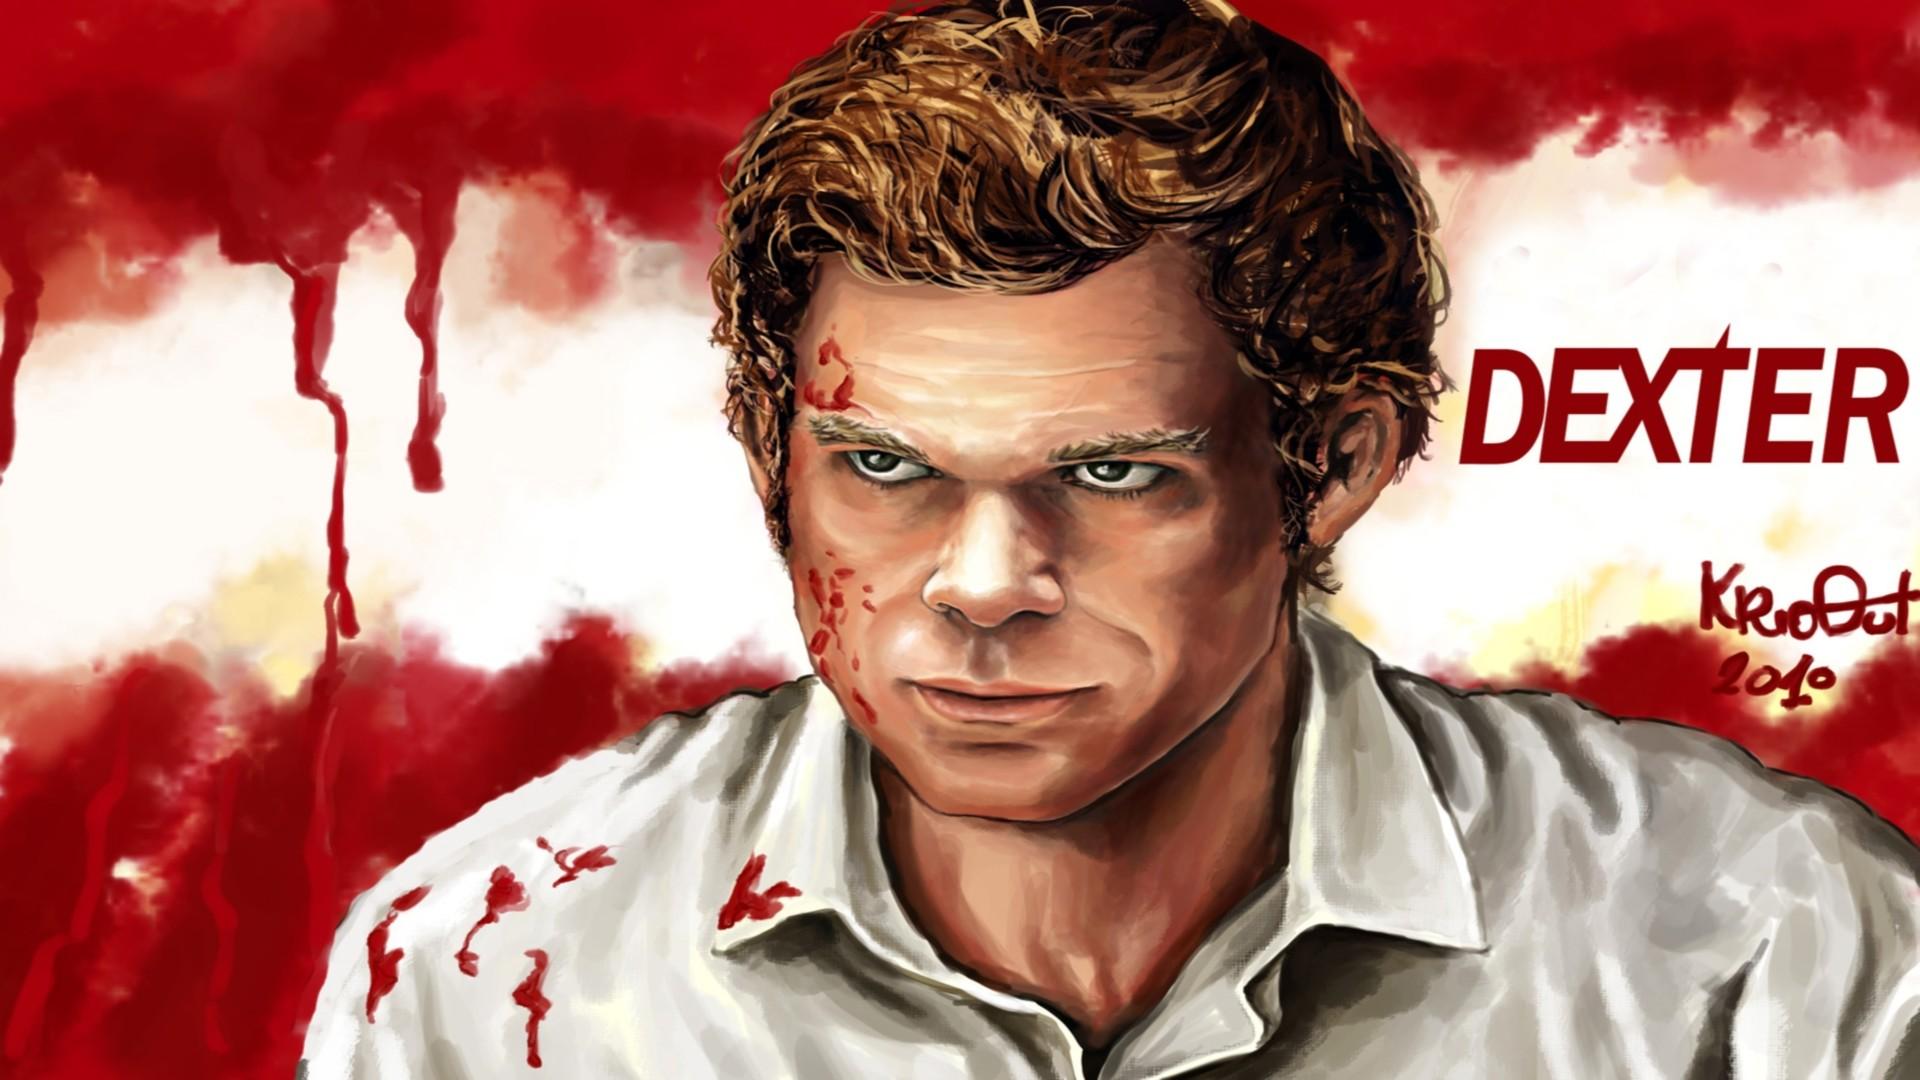 Dexter Images Wallpapers (52 Wallpapers)